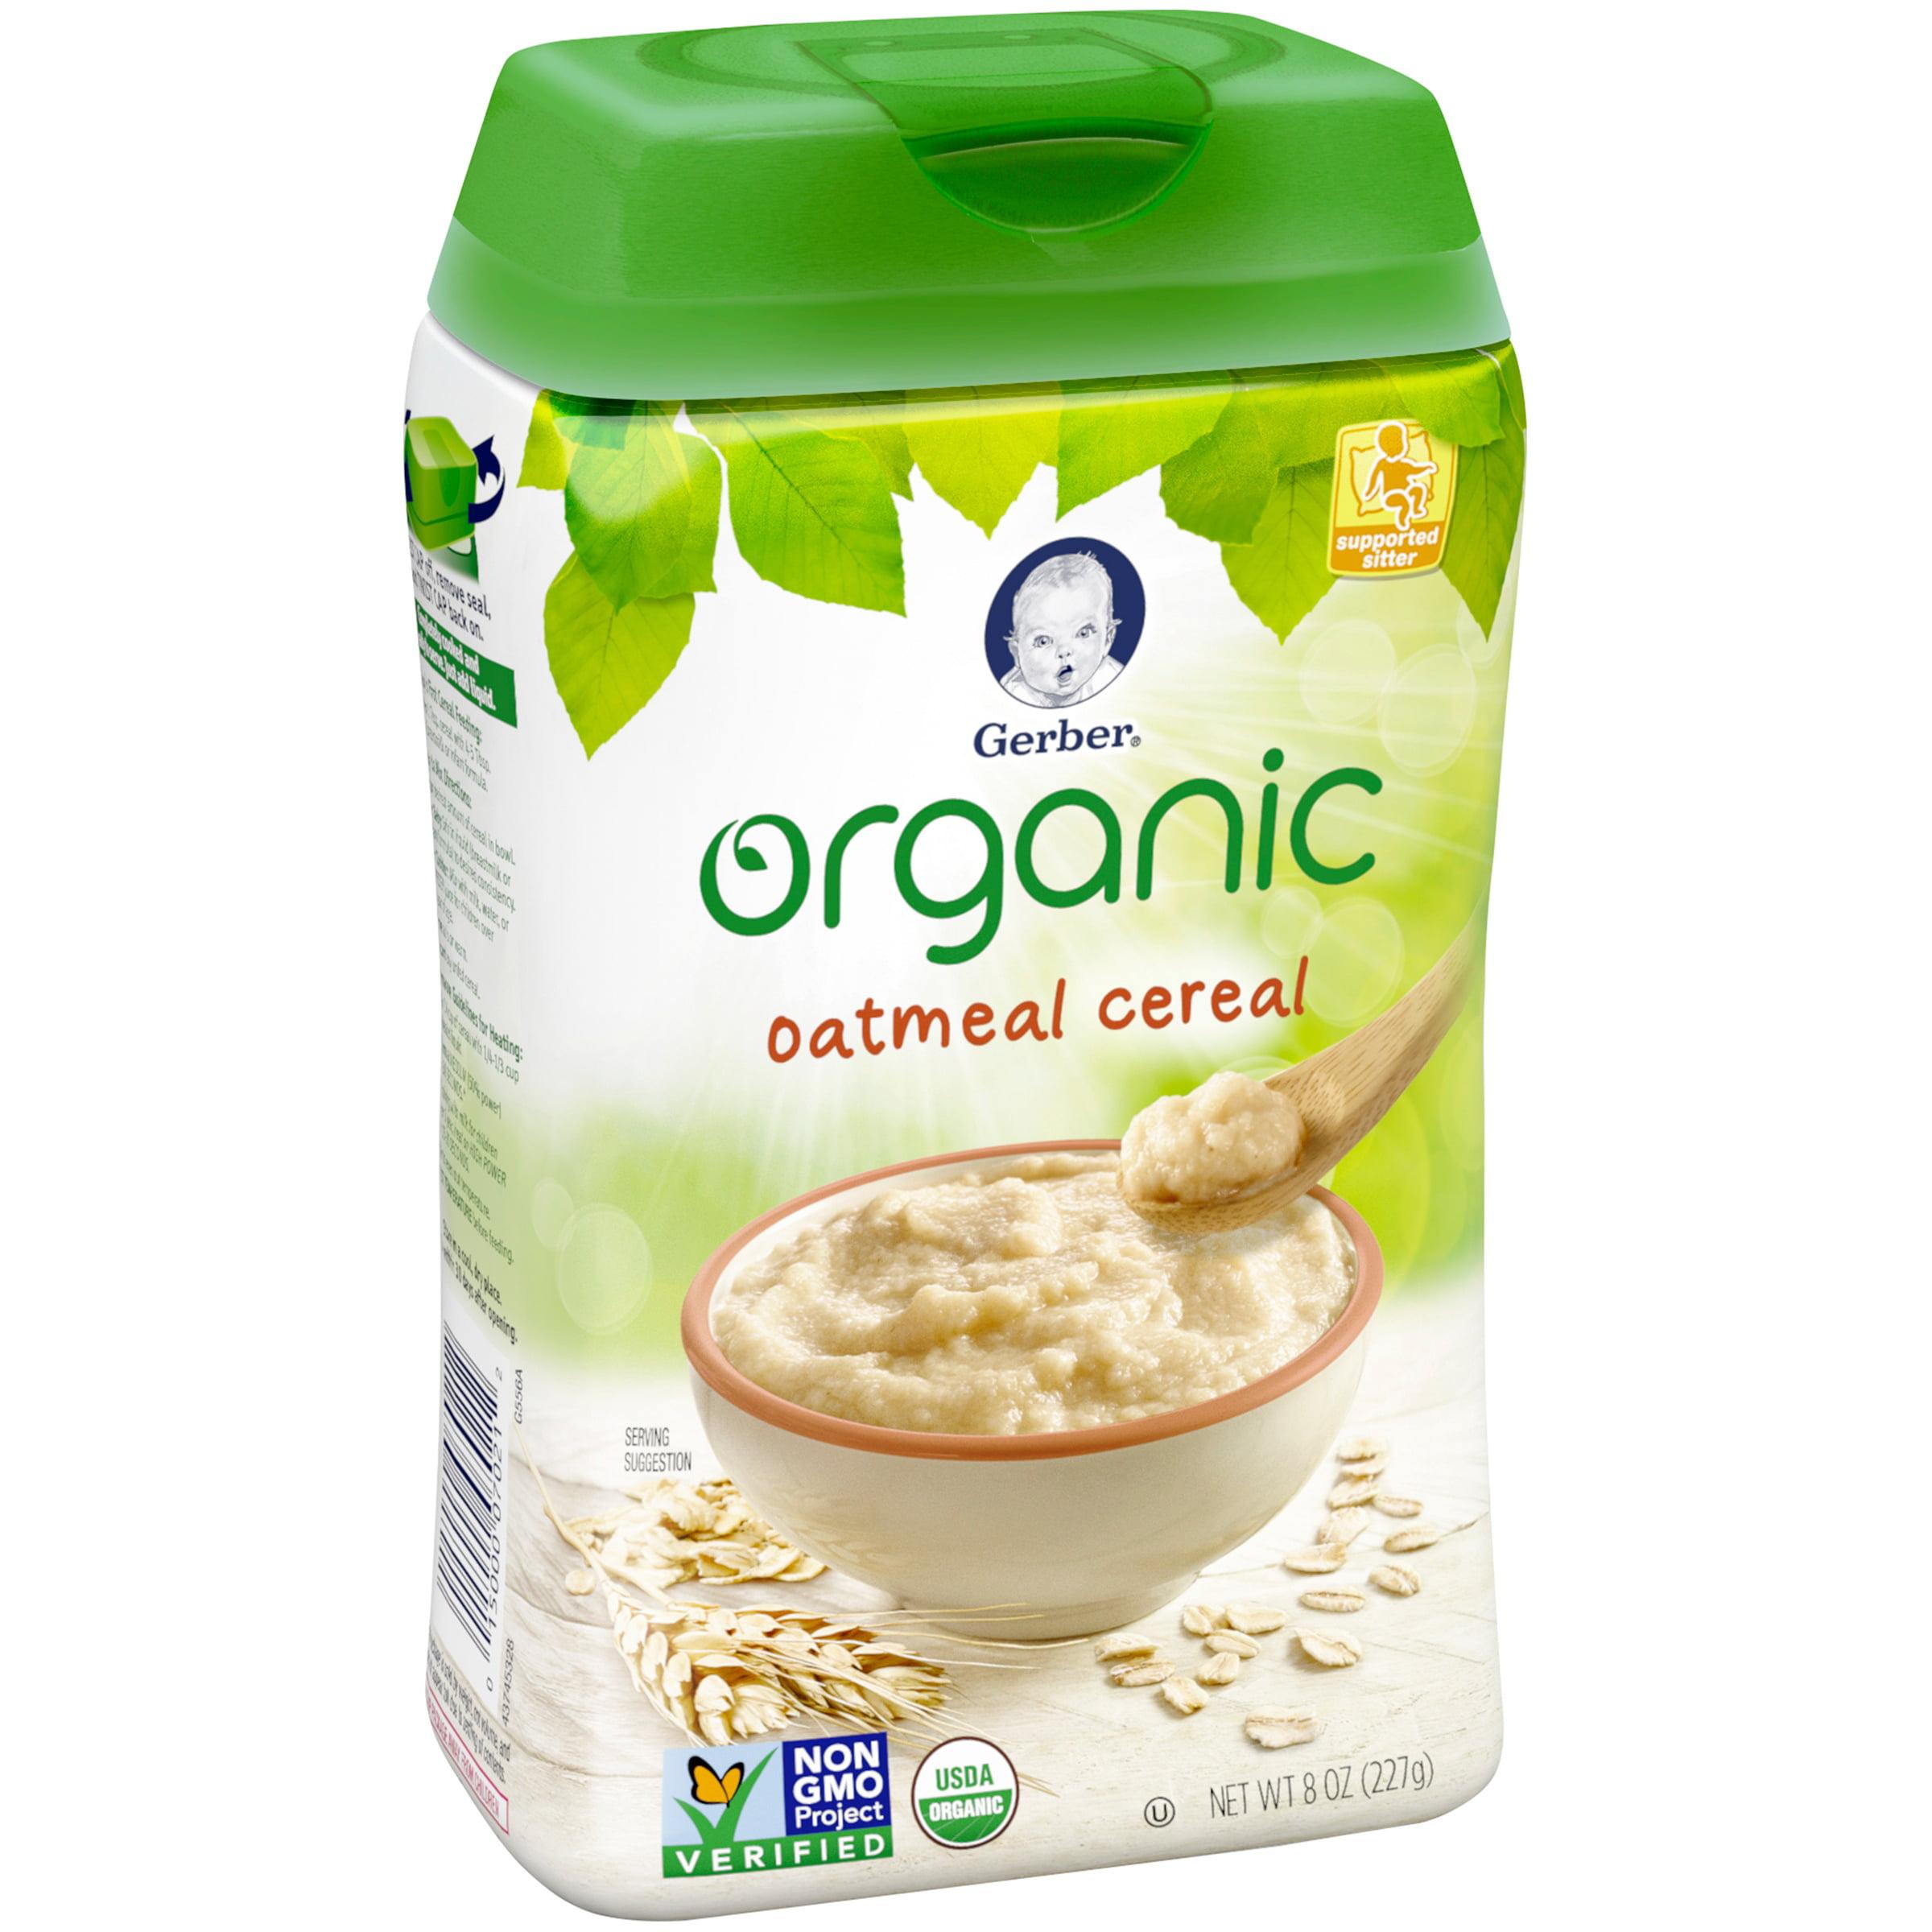 Organic Gerber Baby Food Walmart